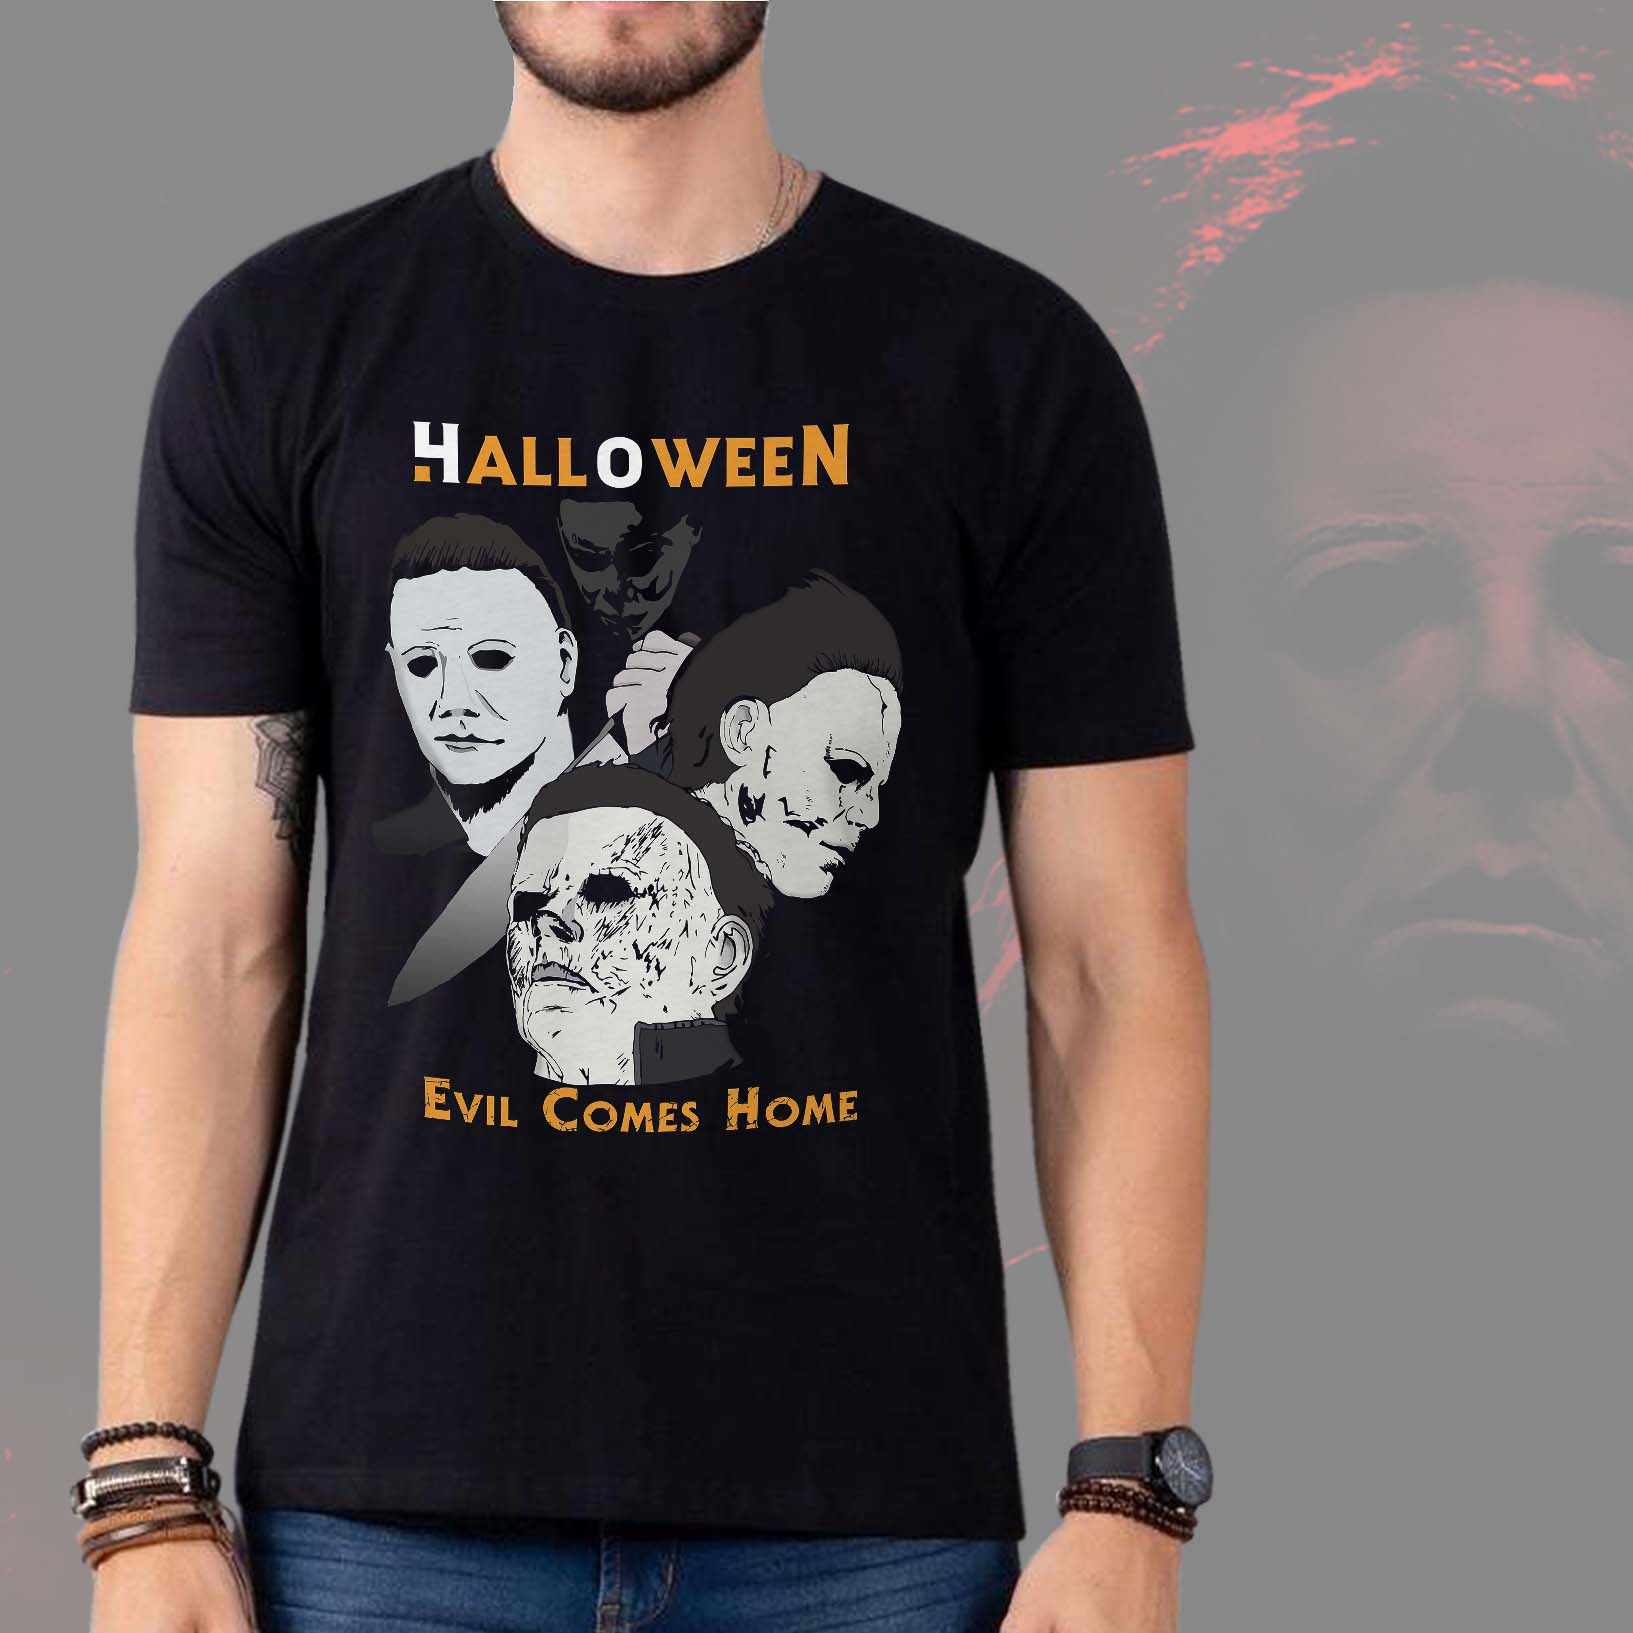 Camiseta Masculina Unissex Michael Myers Halloween Evil Comes Home Terror Horror (Preta) - EV